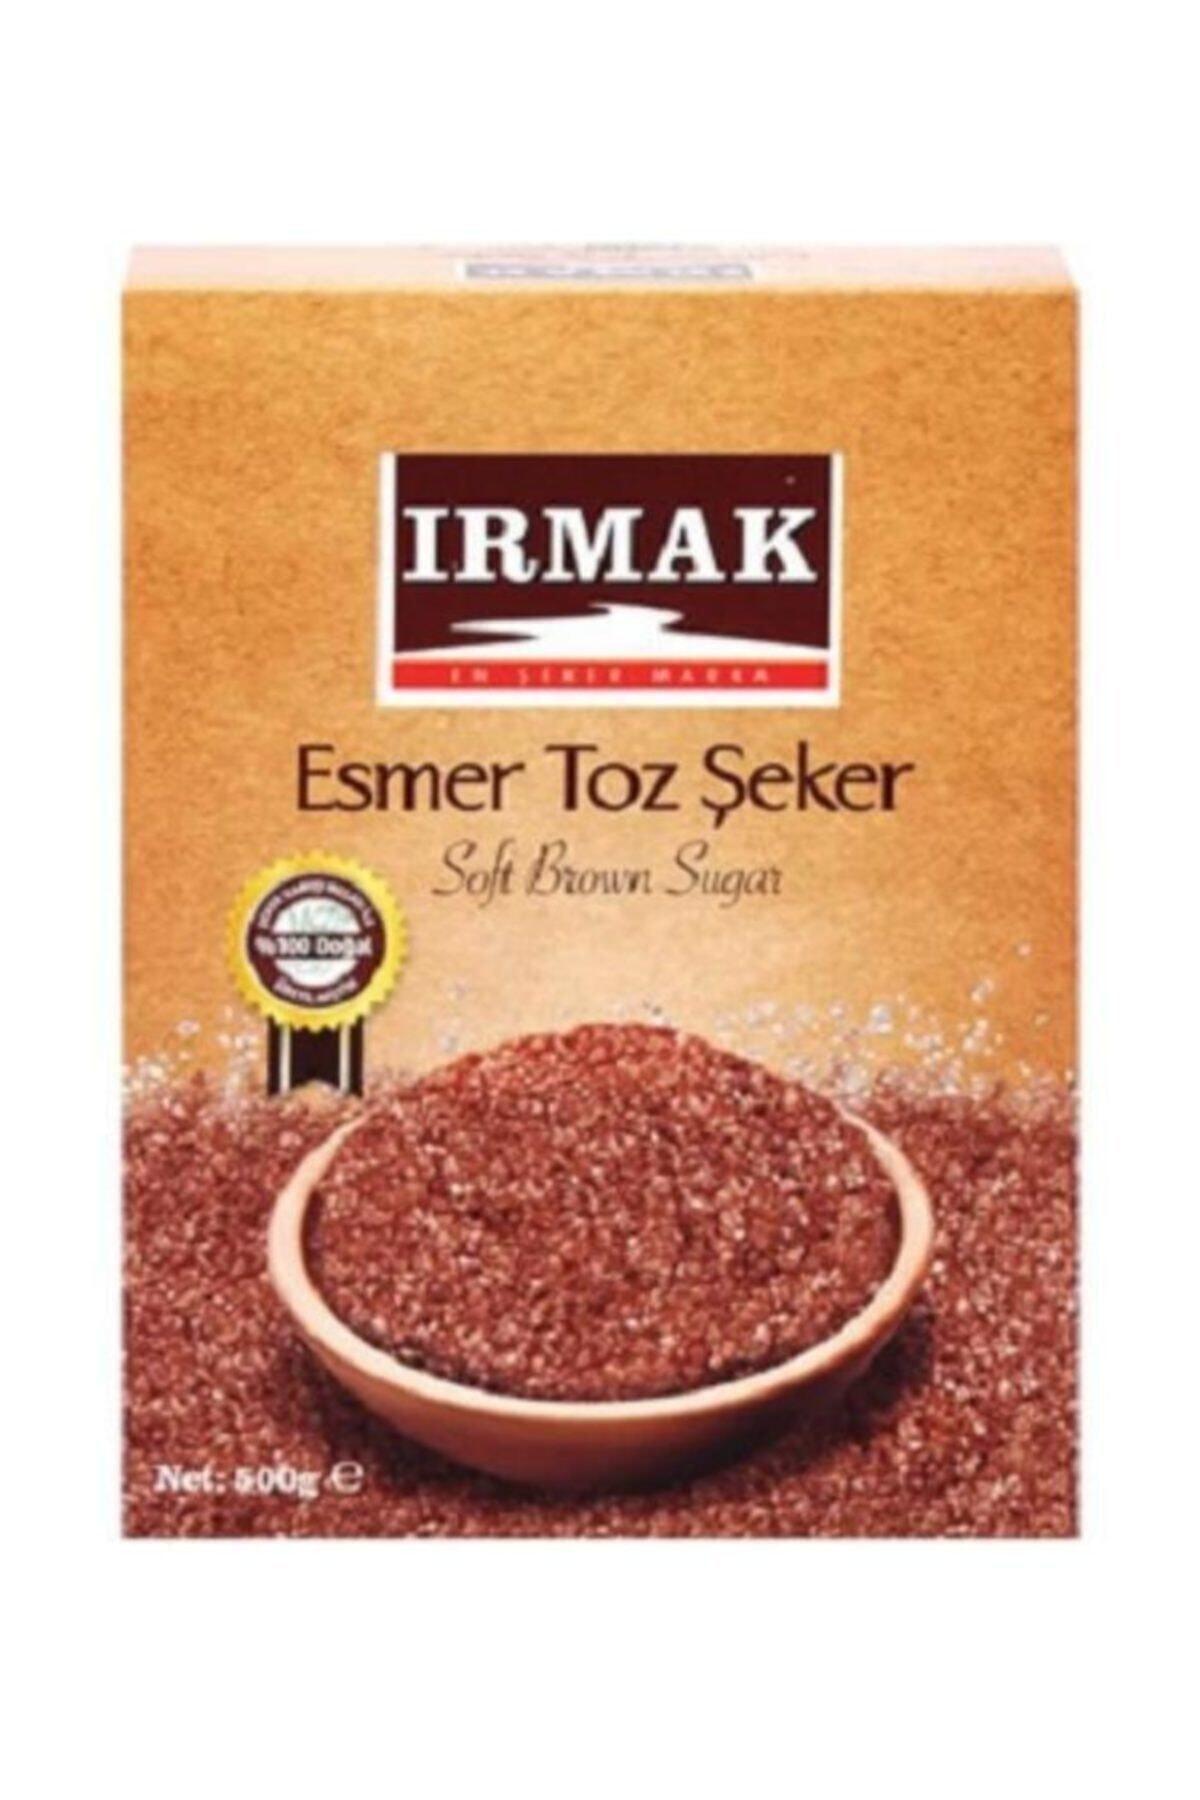 Irmak Esmer Toz Şeker 500 gr 1